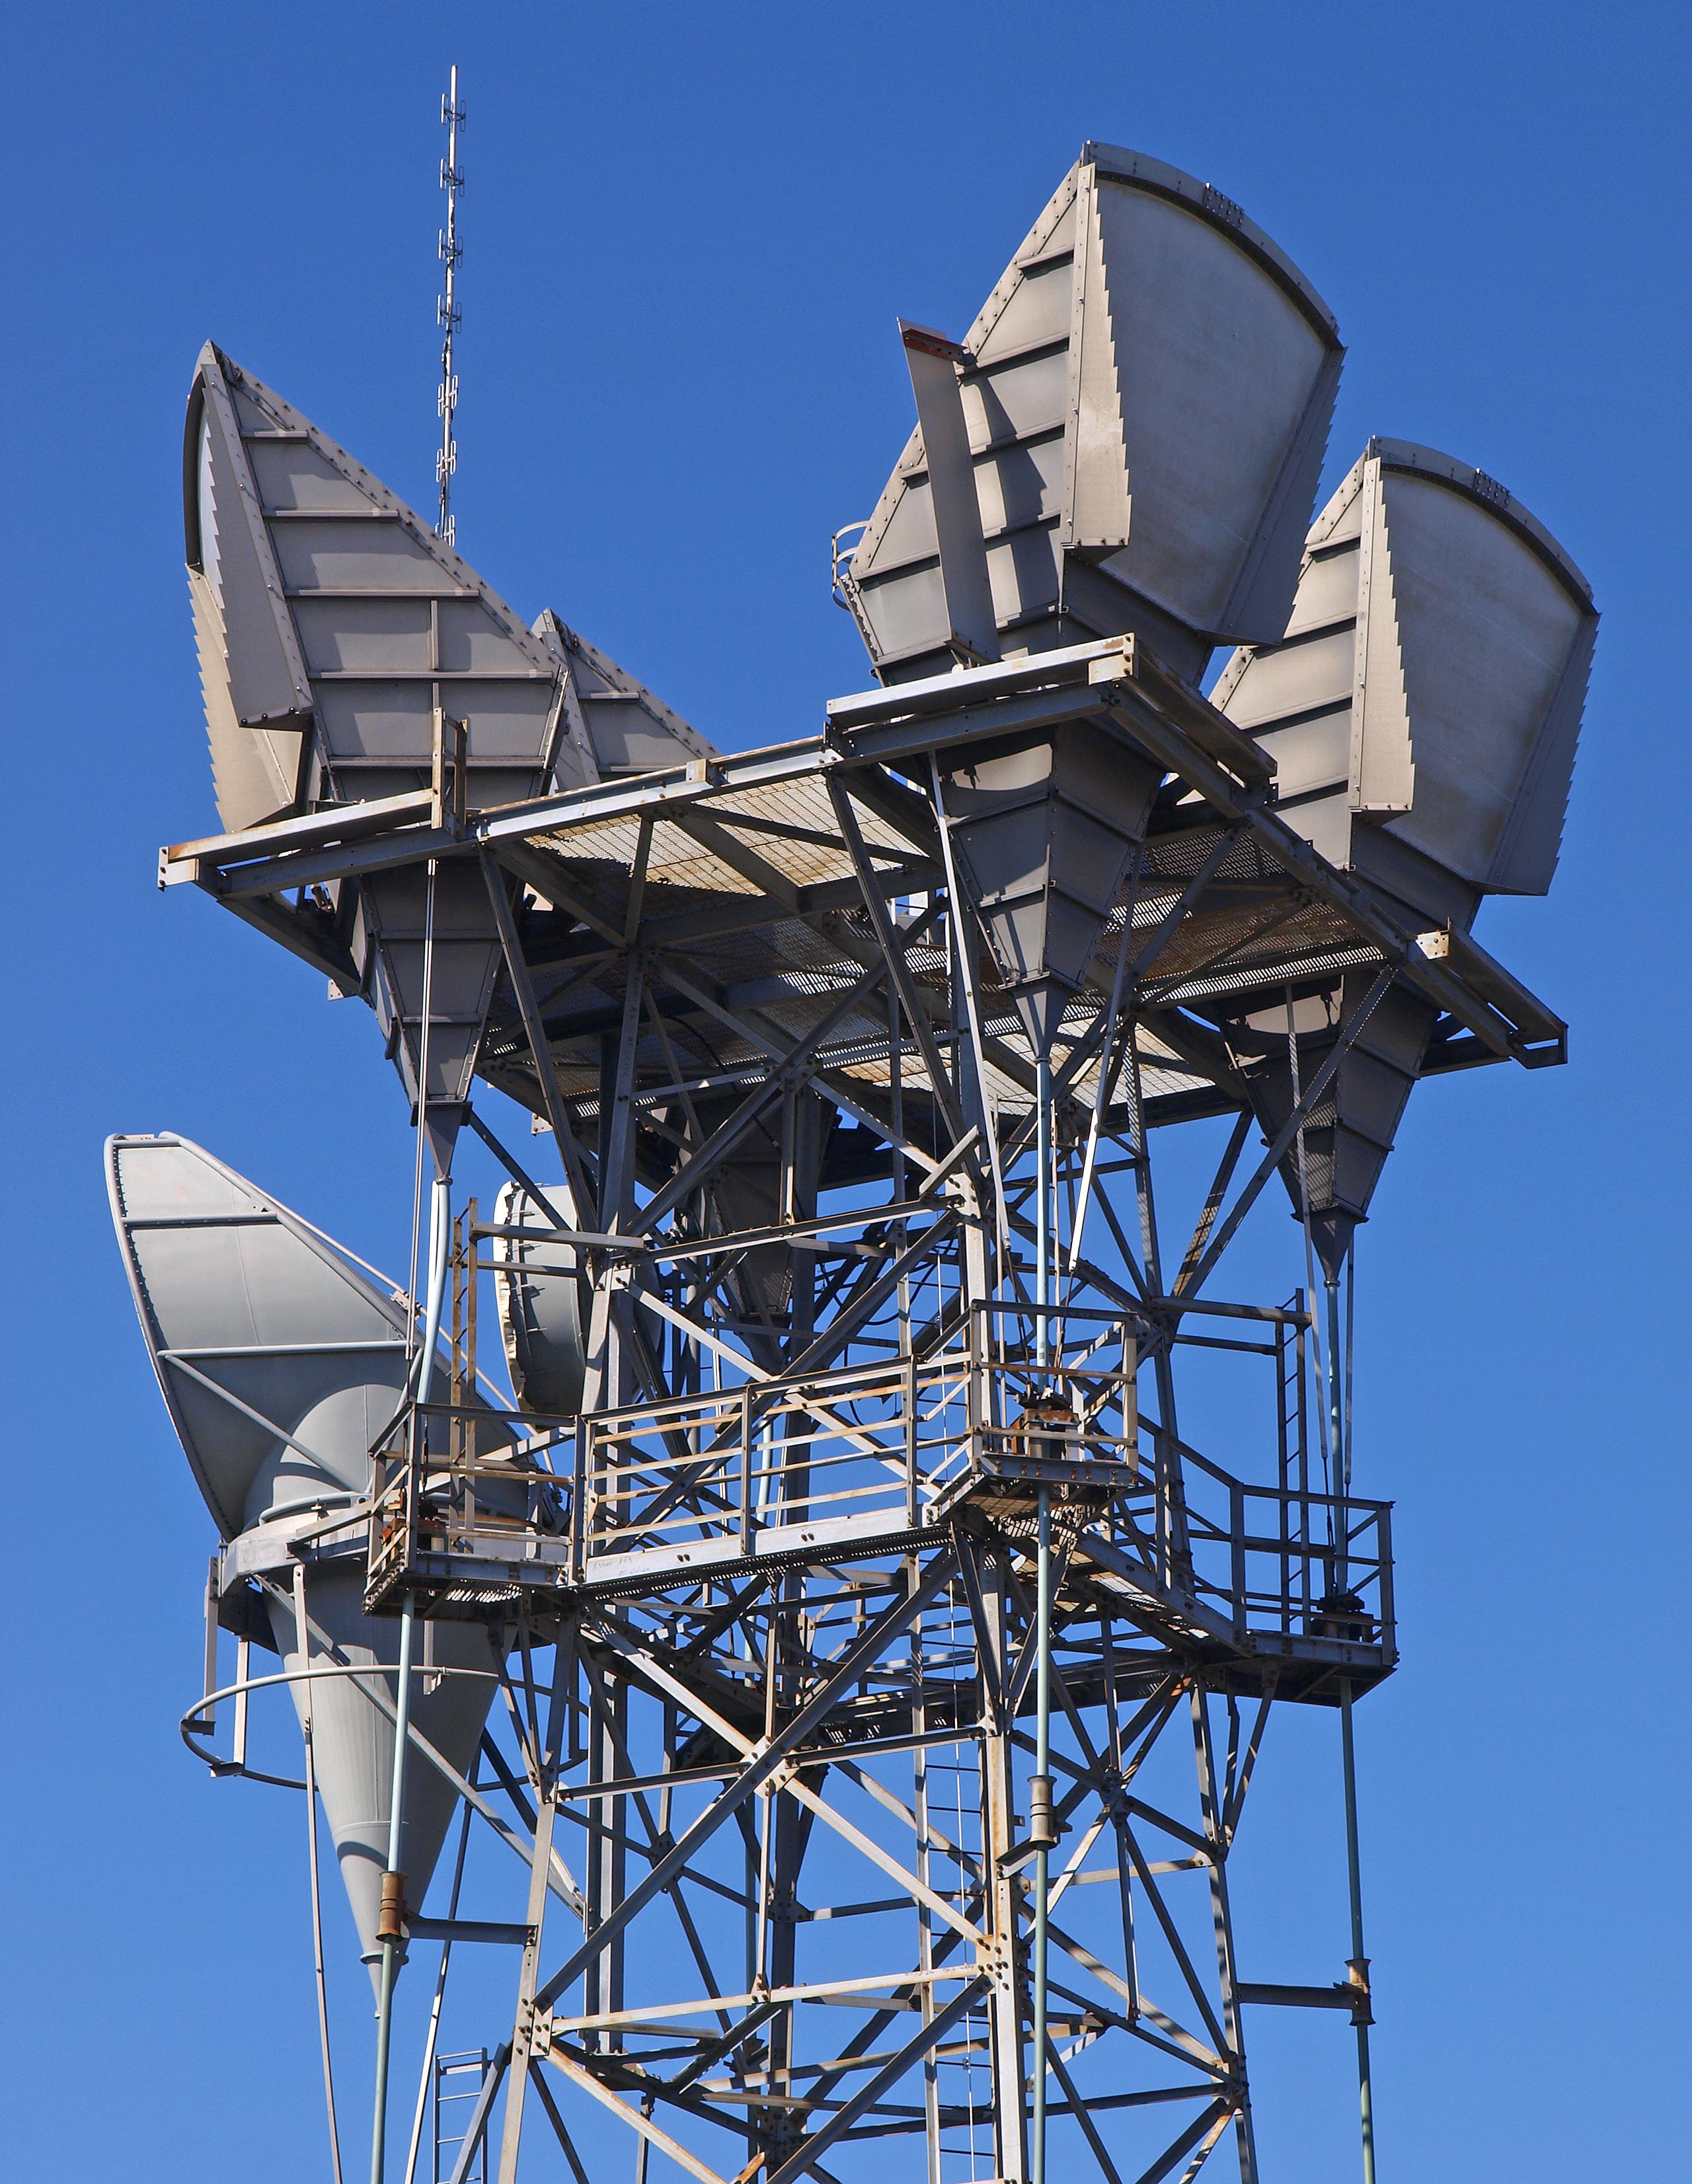 4G-primary-base-station